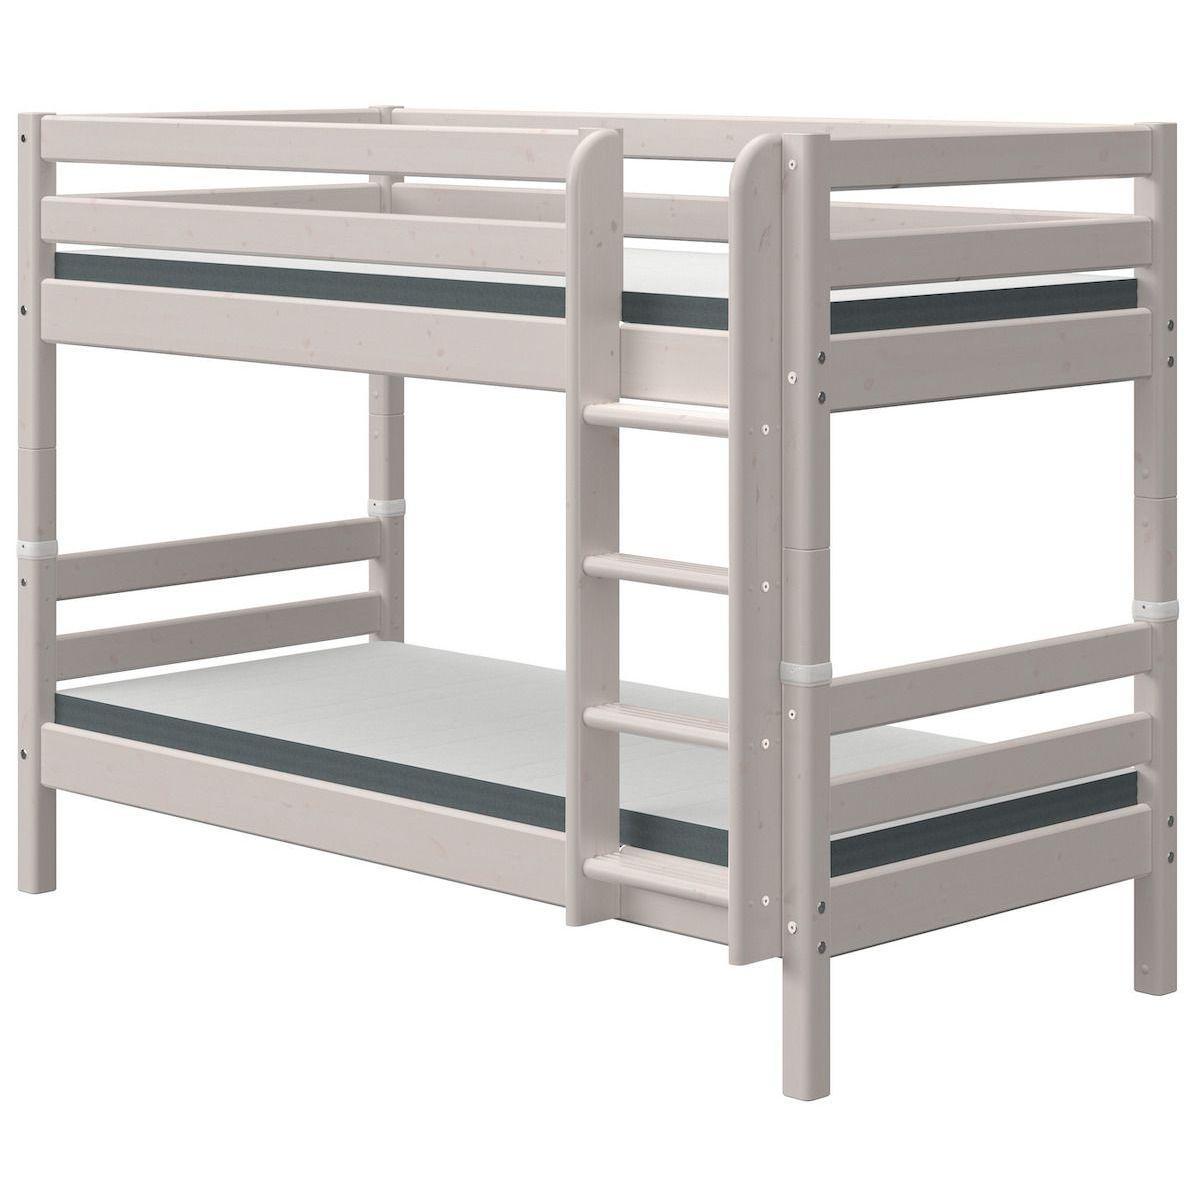 Litera 90x190cm escalera recta CLASSIC Flexa grey washed